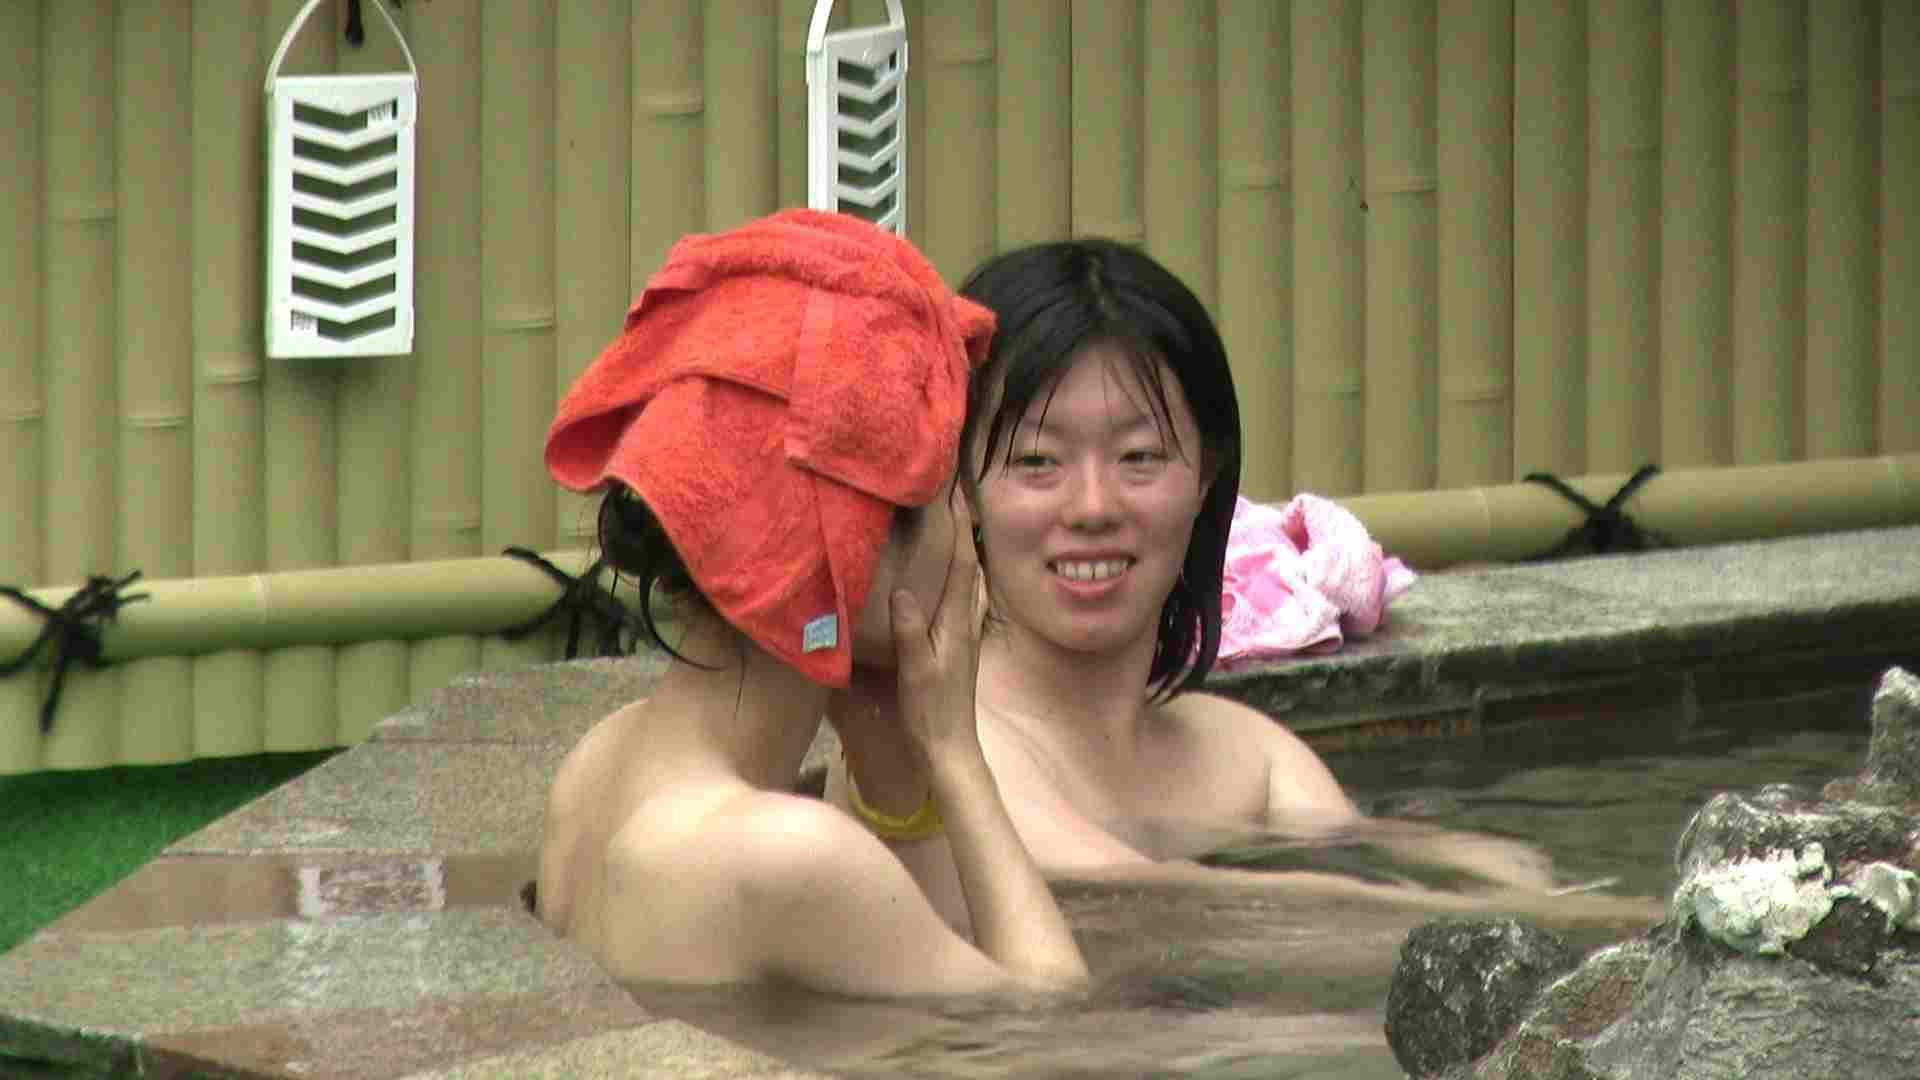 Aquaな露天風呂Vol.187 盗撮   HなOL  96pic 18